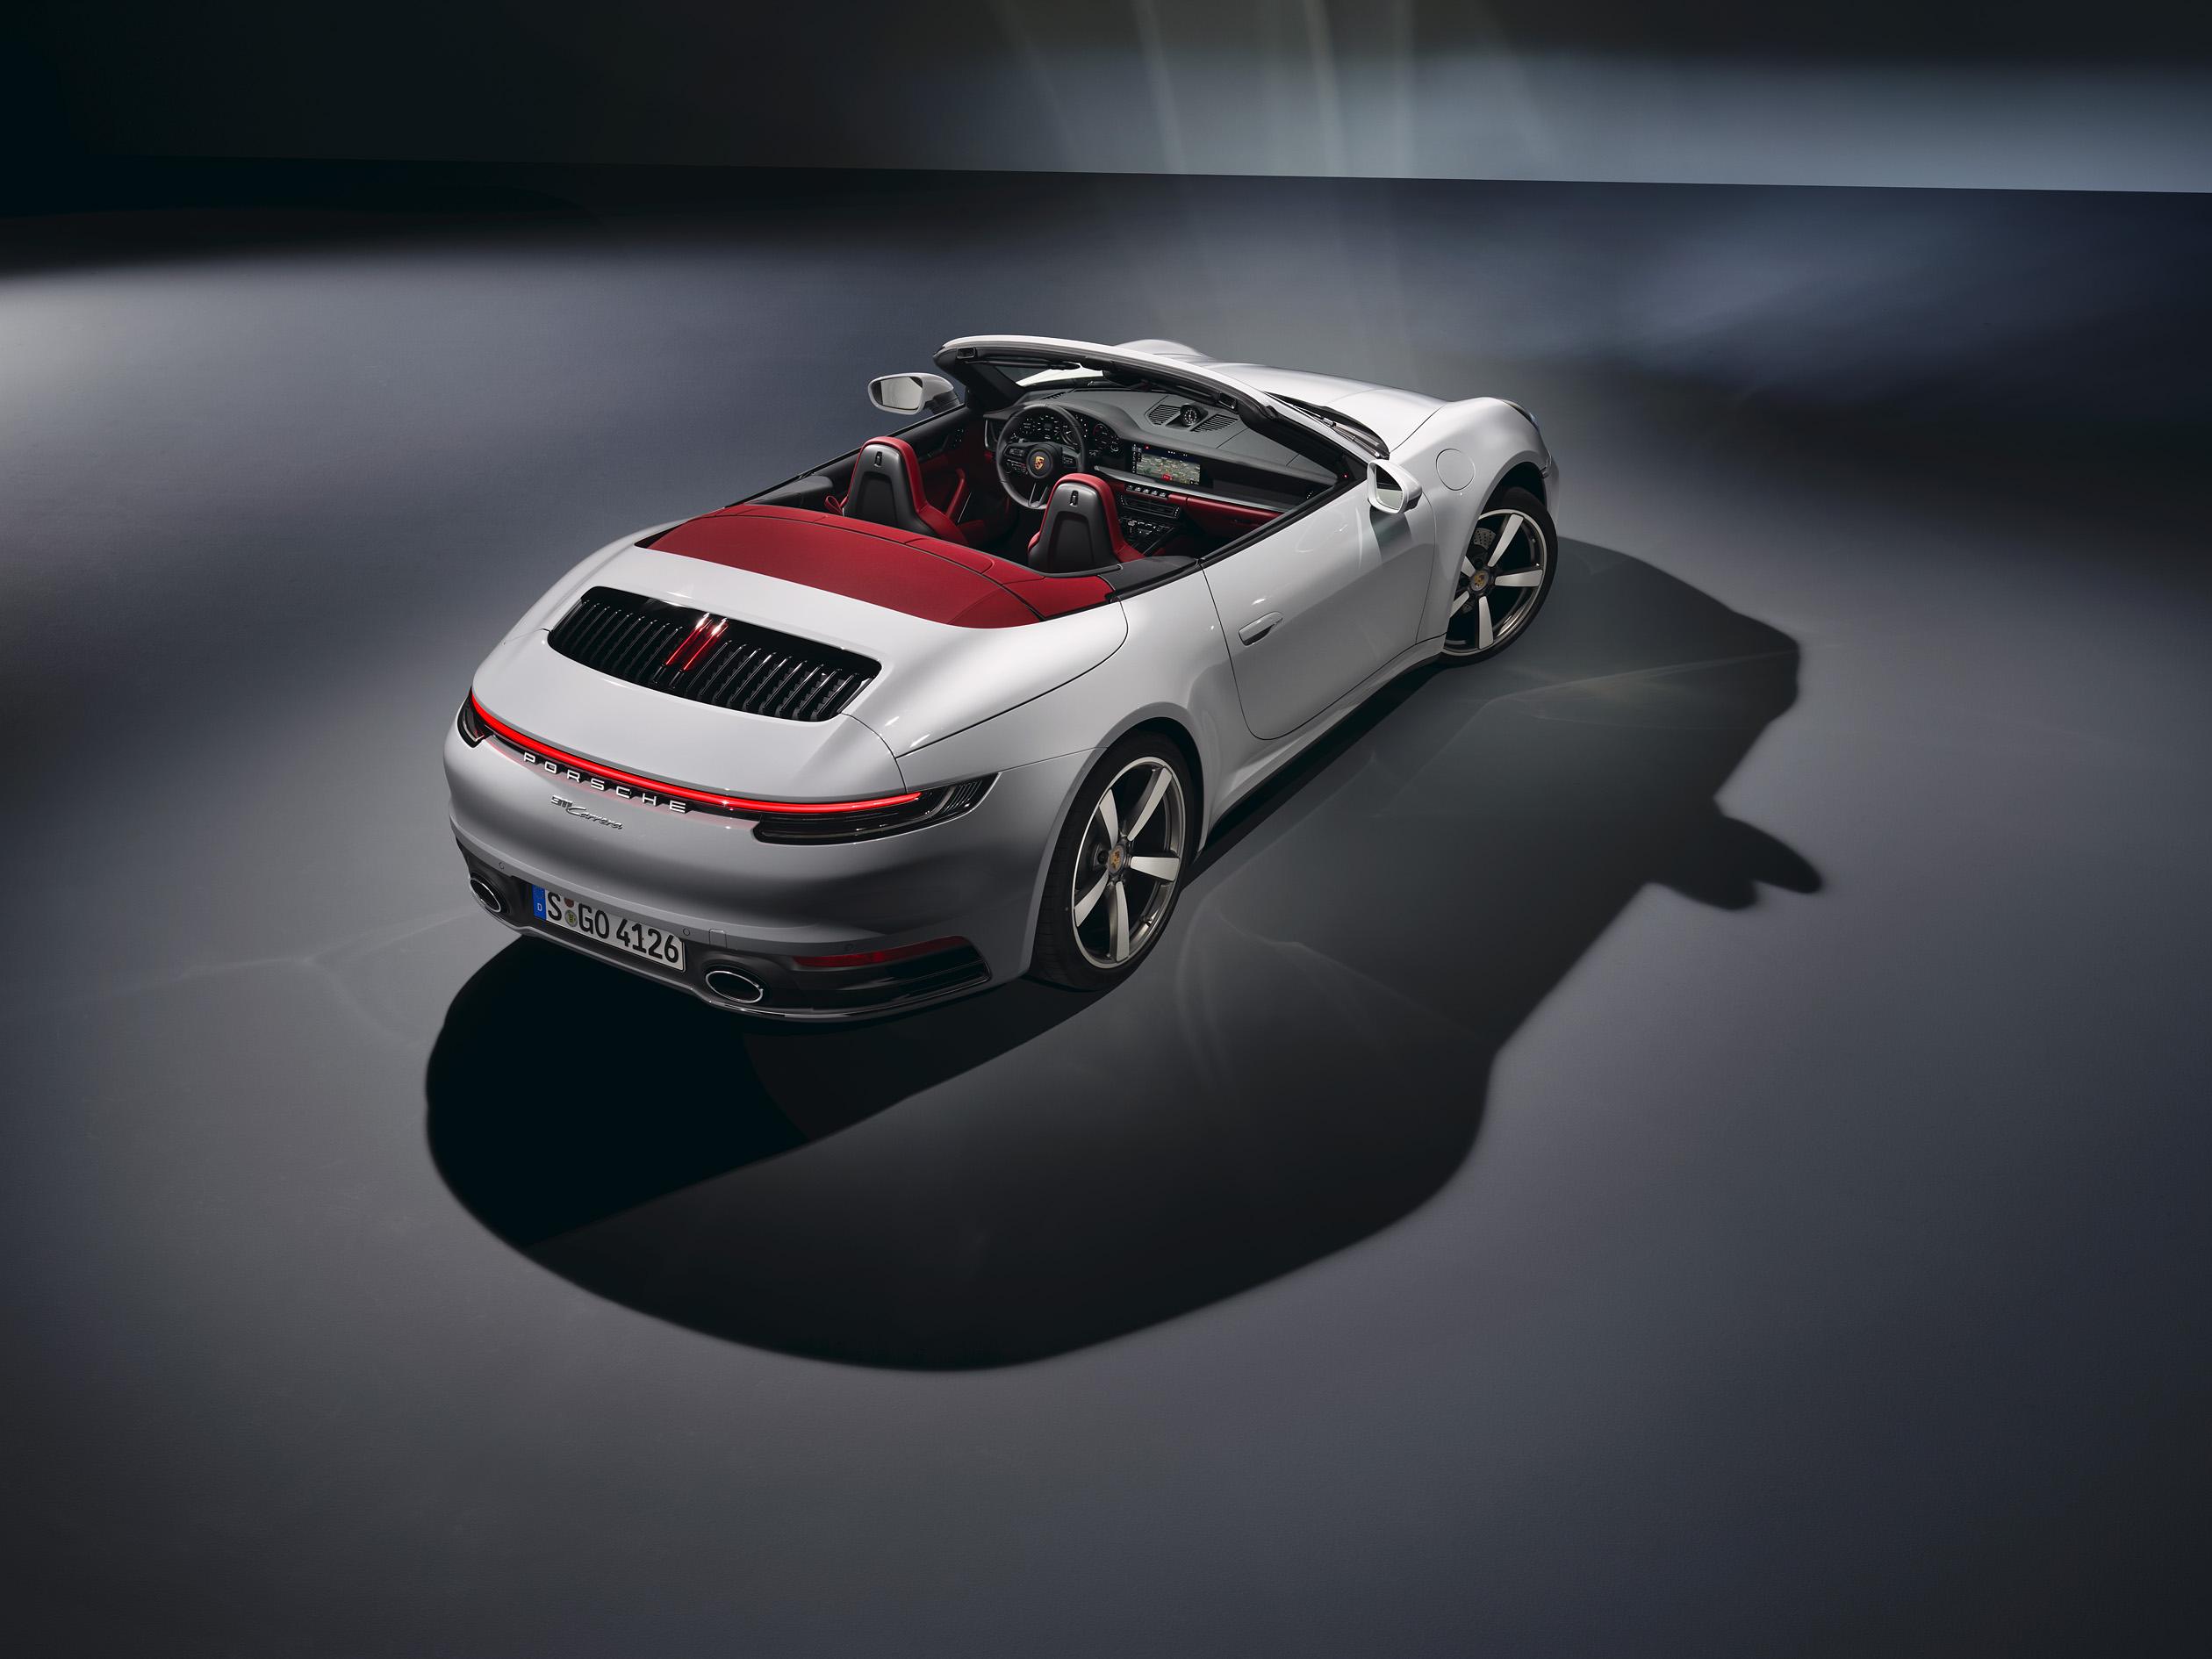 Porsche lanseaza noile 911 Carrera Coupe si 911 Carrera Cabriolet